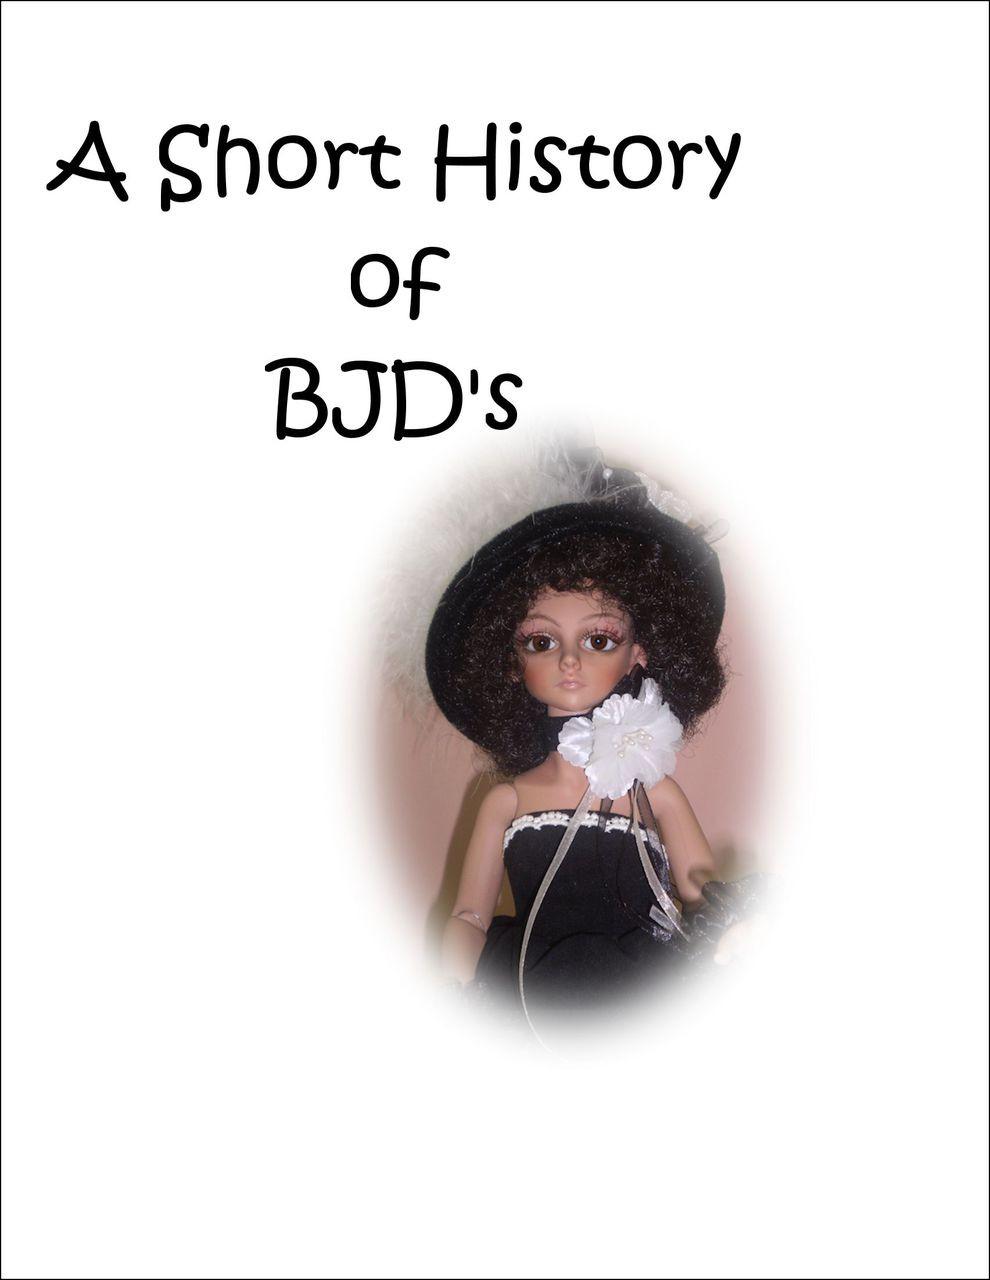 History of BJD's